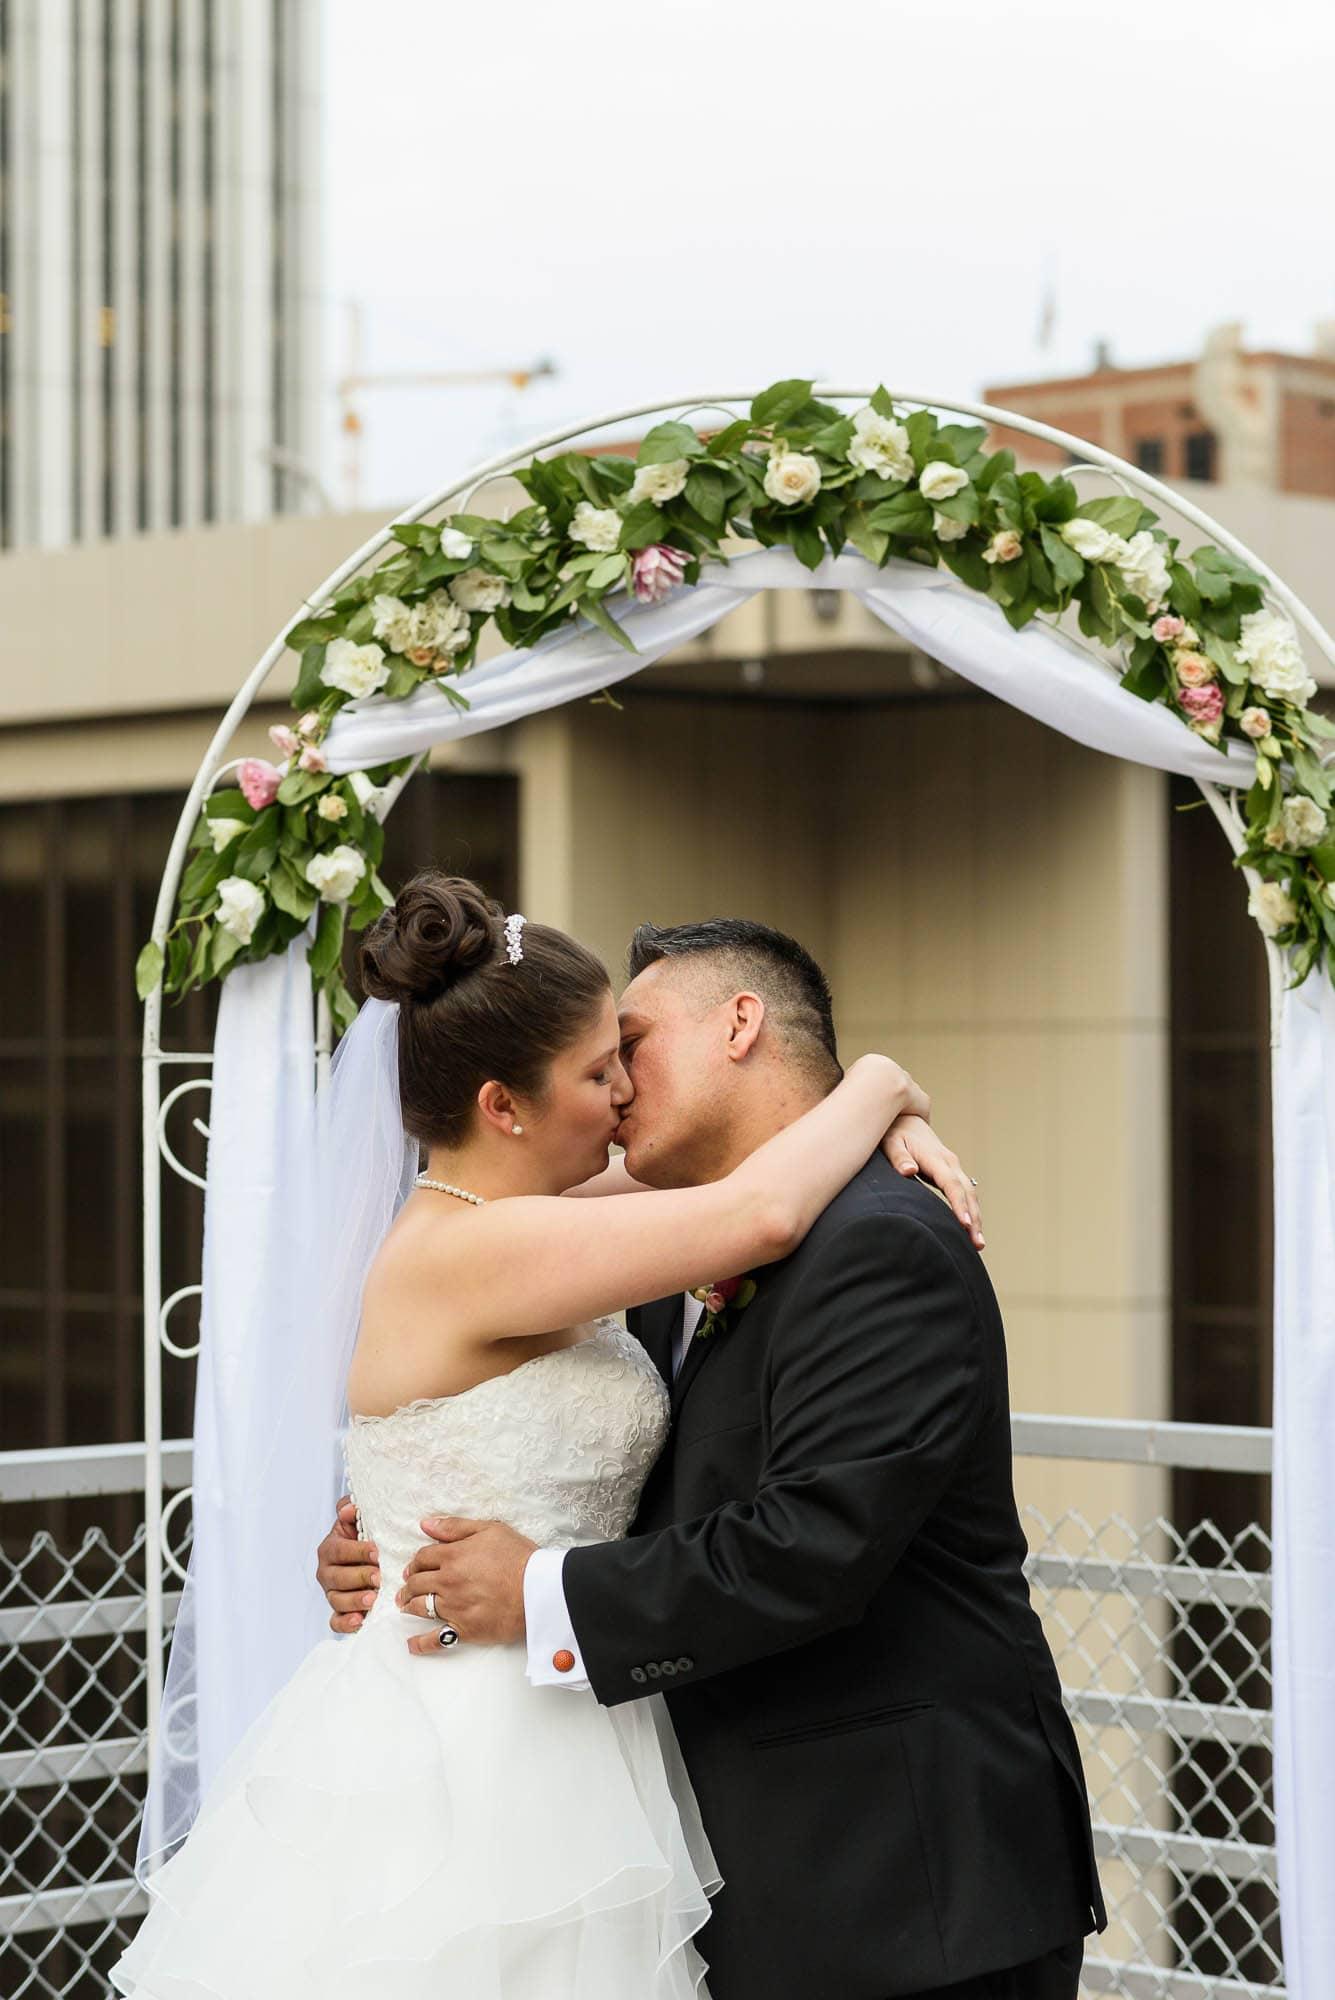 023_Alan_and_Heidi_Wedding_Nicole_Roman